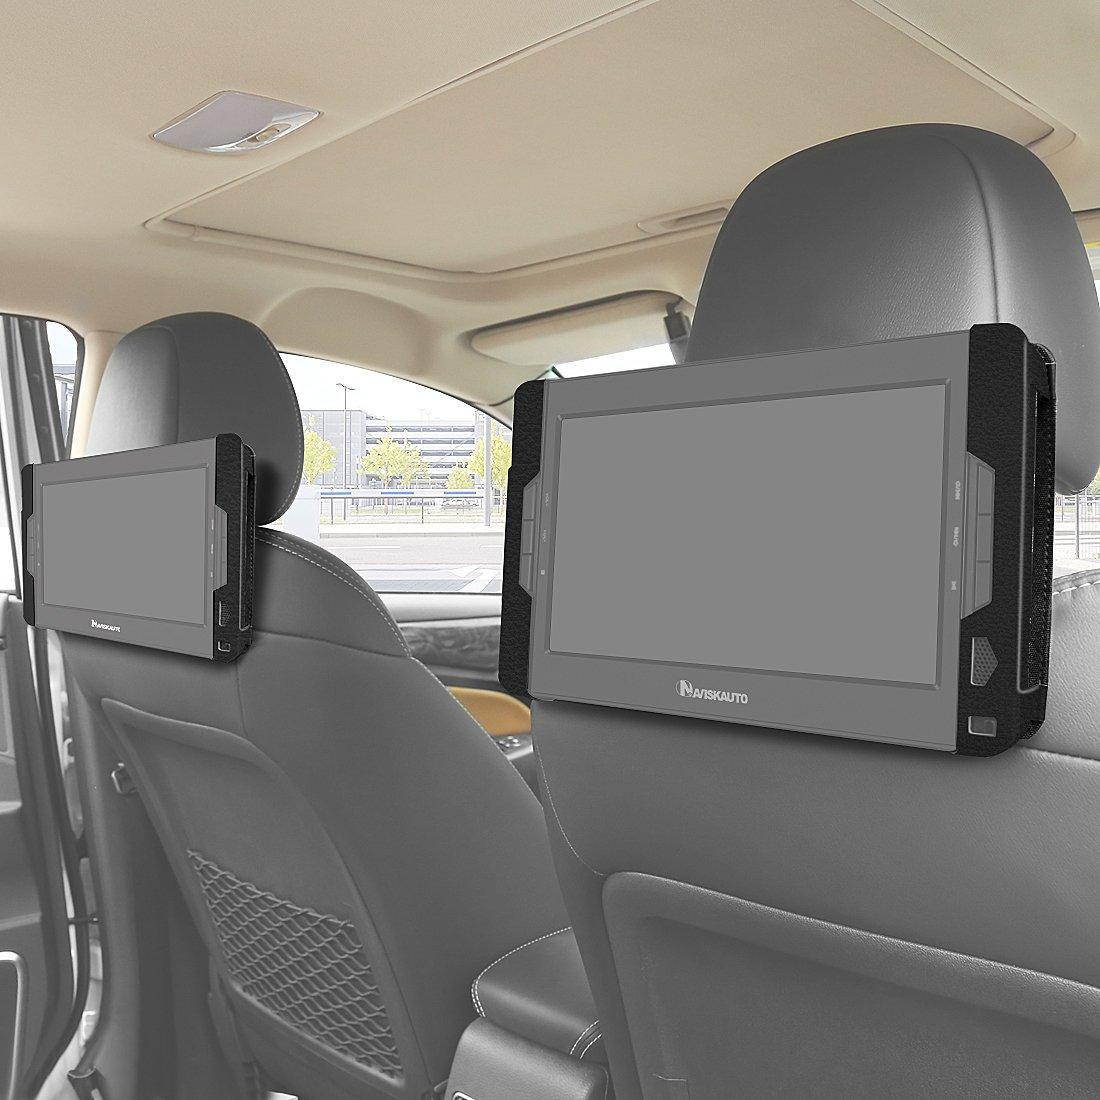 NAVISKAUTO Dual Car Headrest Mount Holder Bracket Only for NAVISKAUTO 10.1 Inch Dual Screen DVD Player and Dual DVD Player by NAVISKAUTO